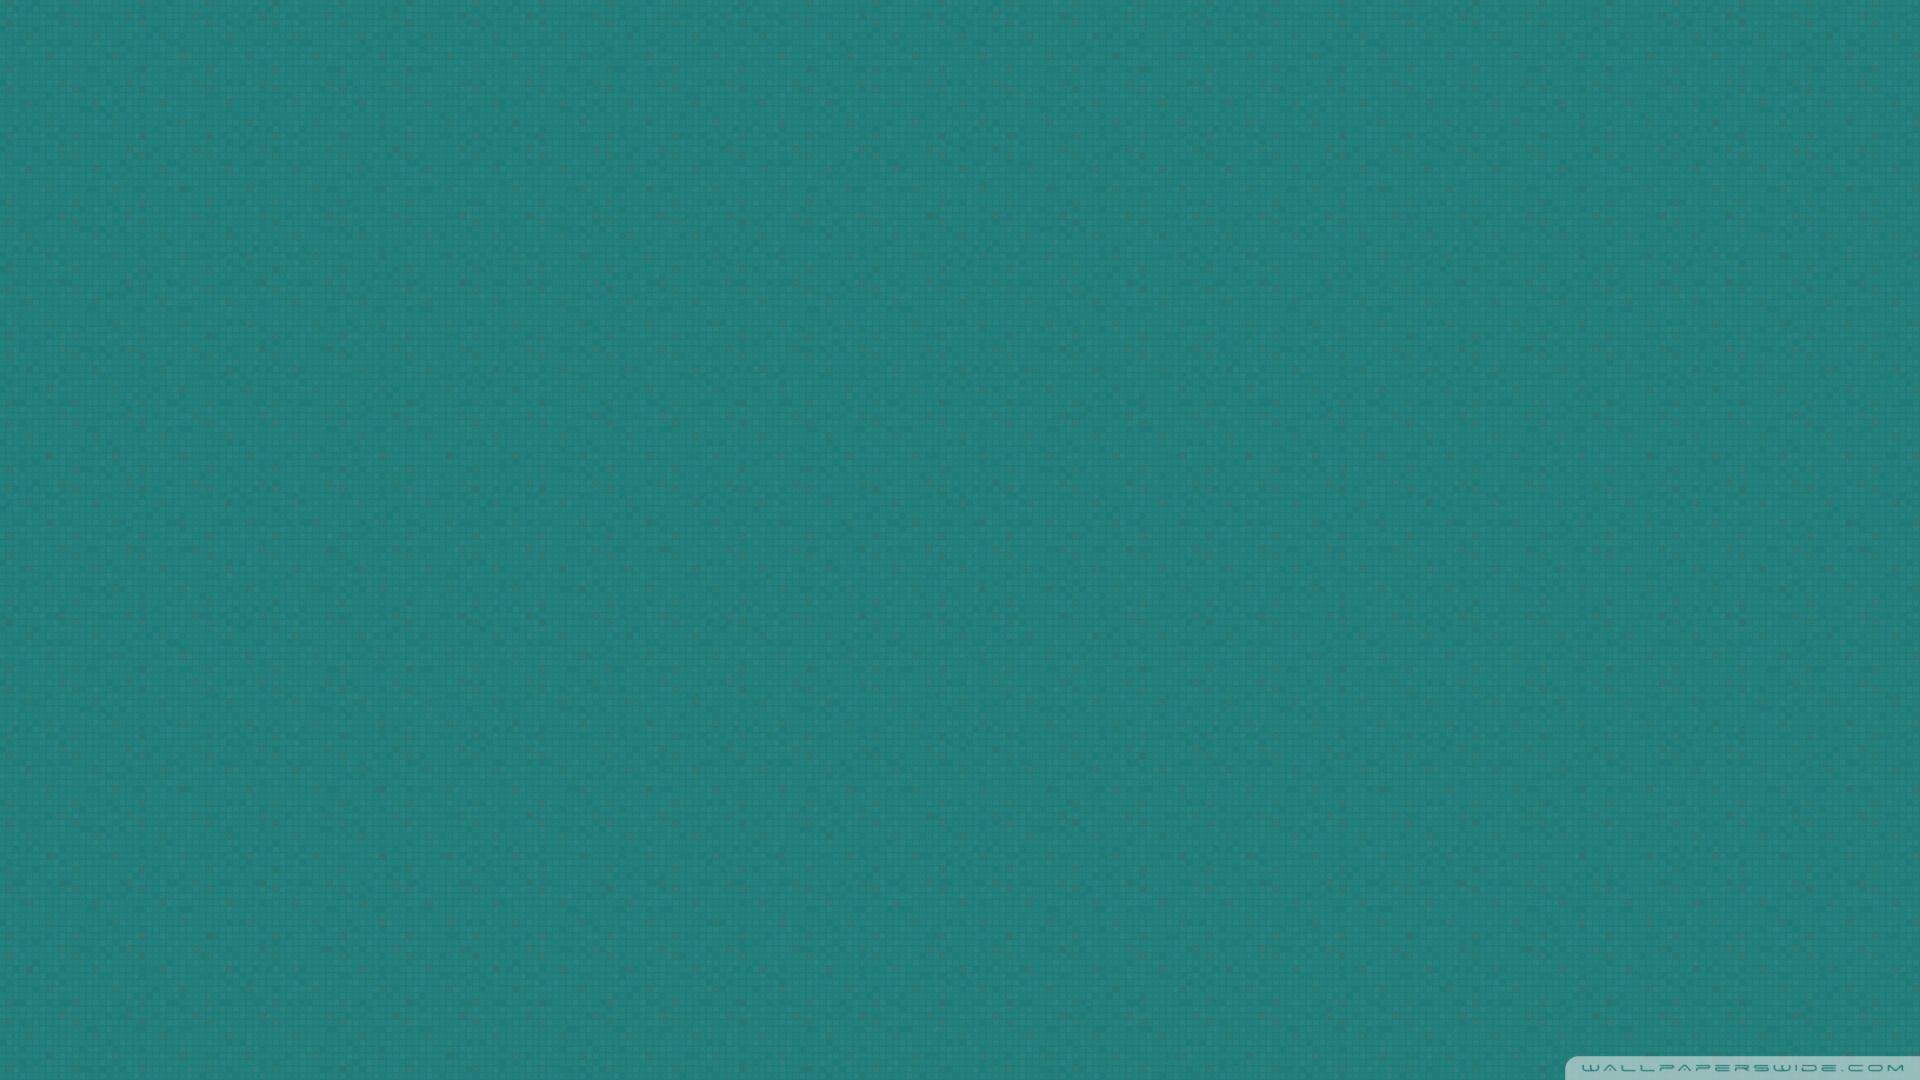 Aqua Colored Wallpaper - WallpaperSafari